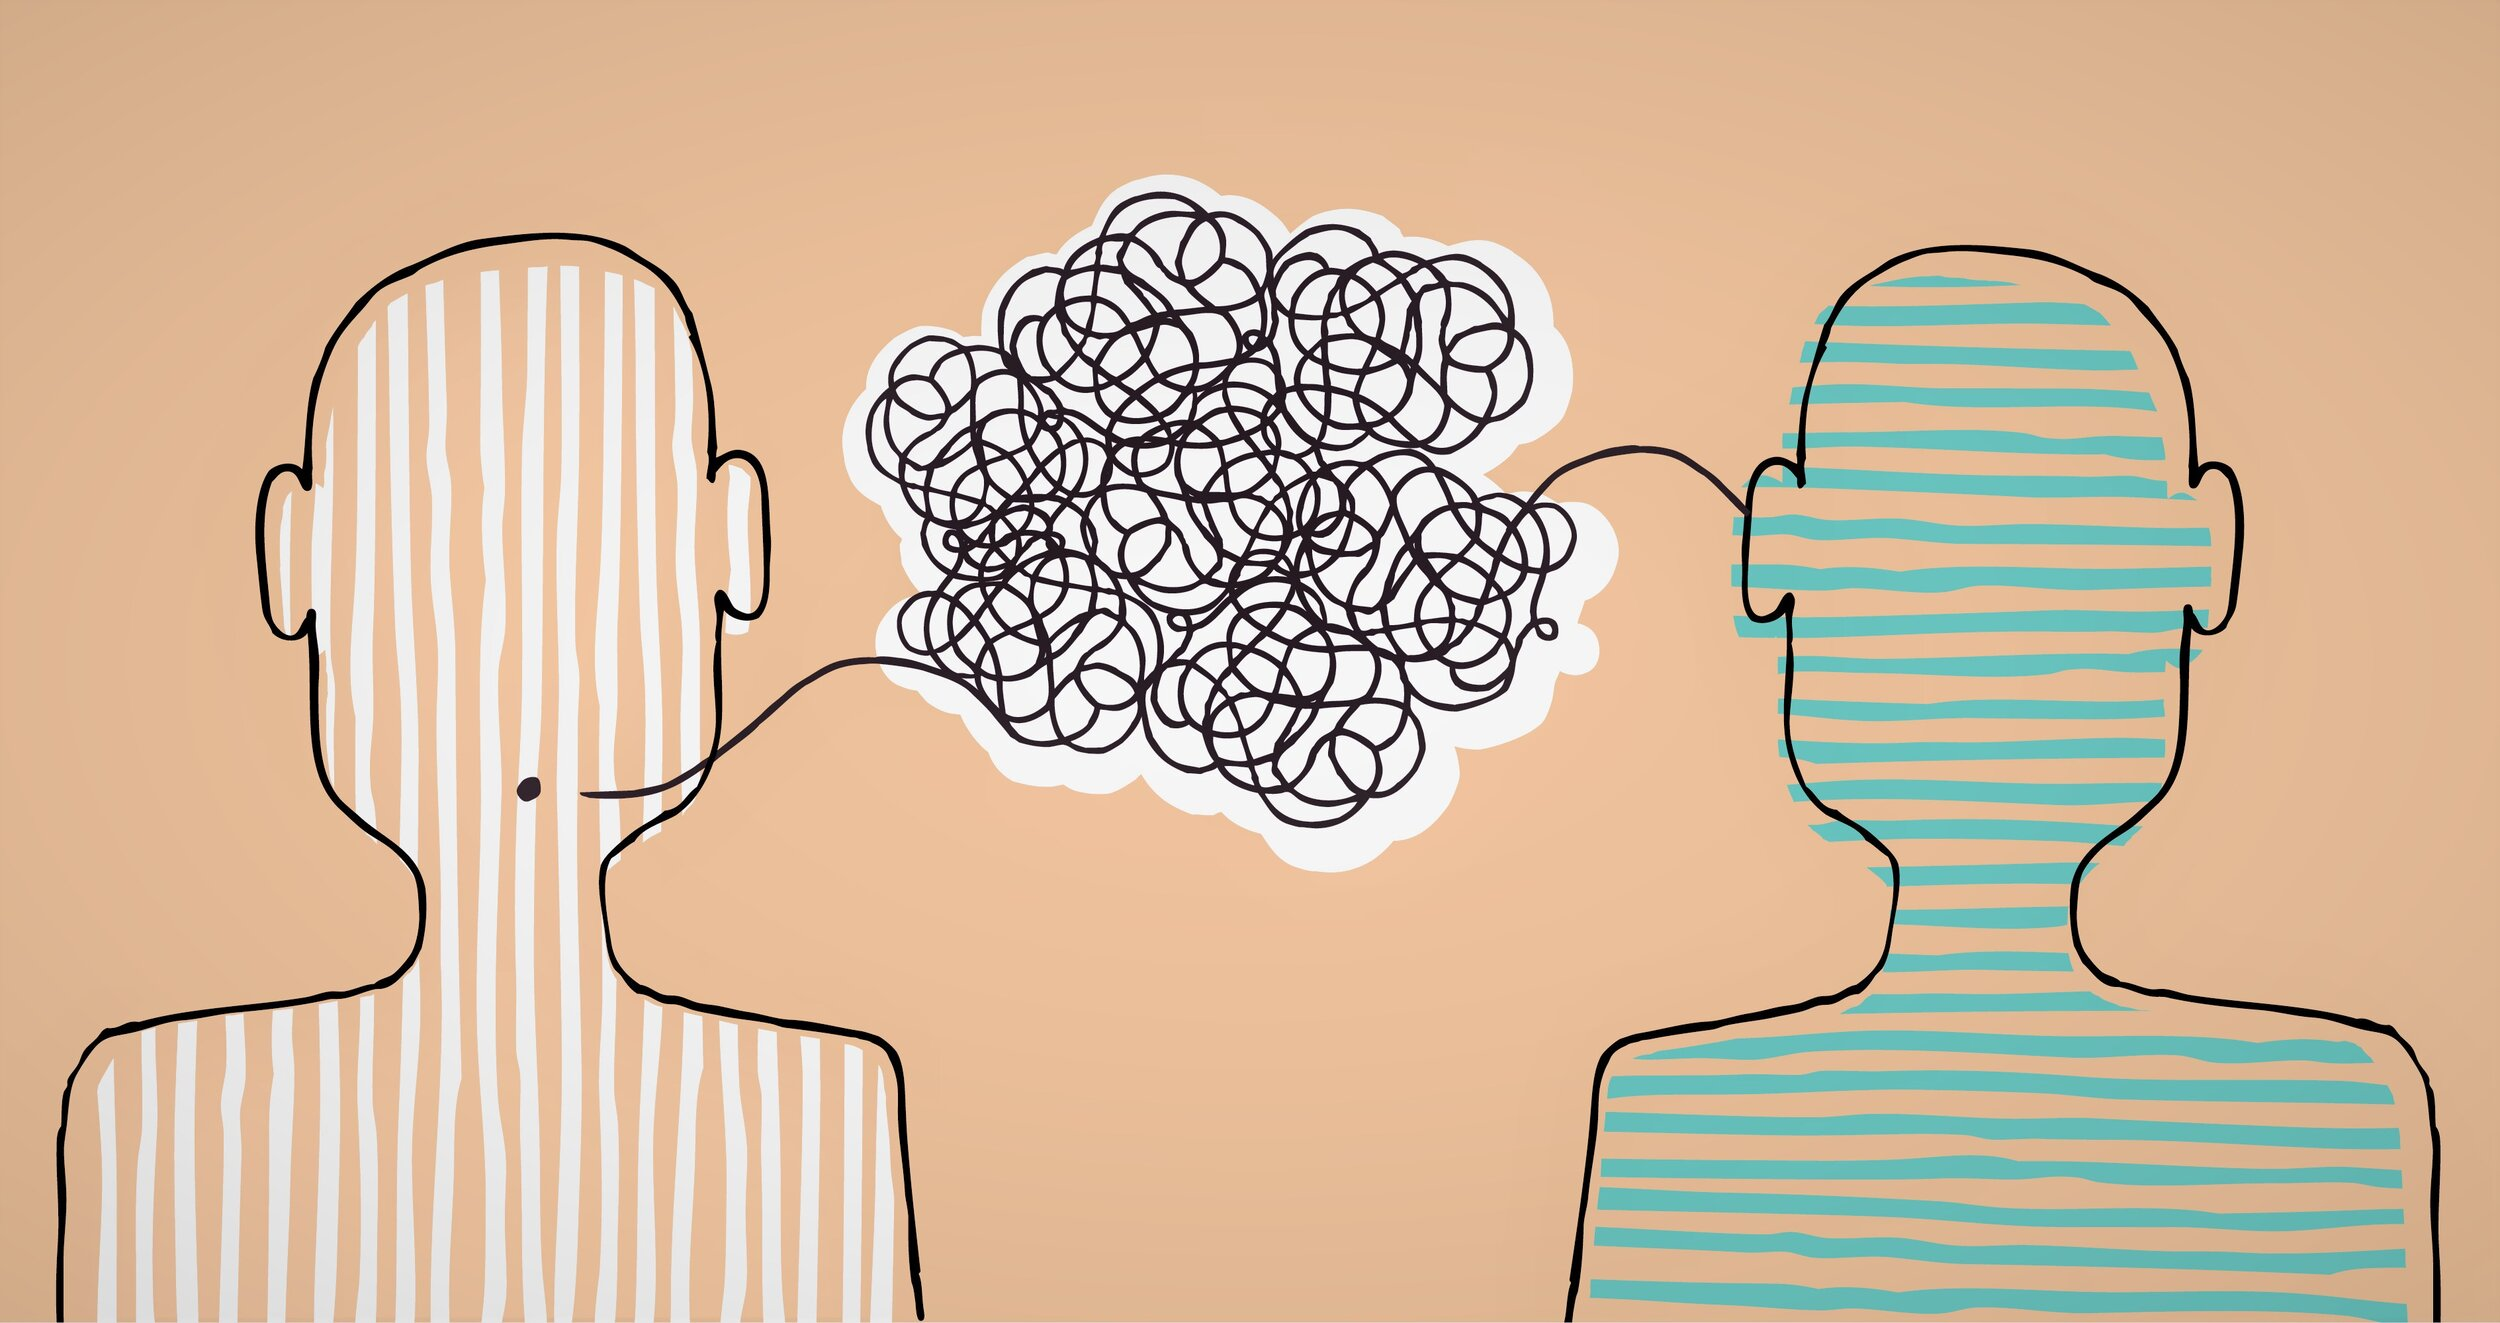 Outside the bottle | On miscommunication and generational mismatches